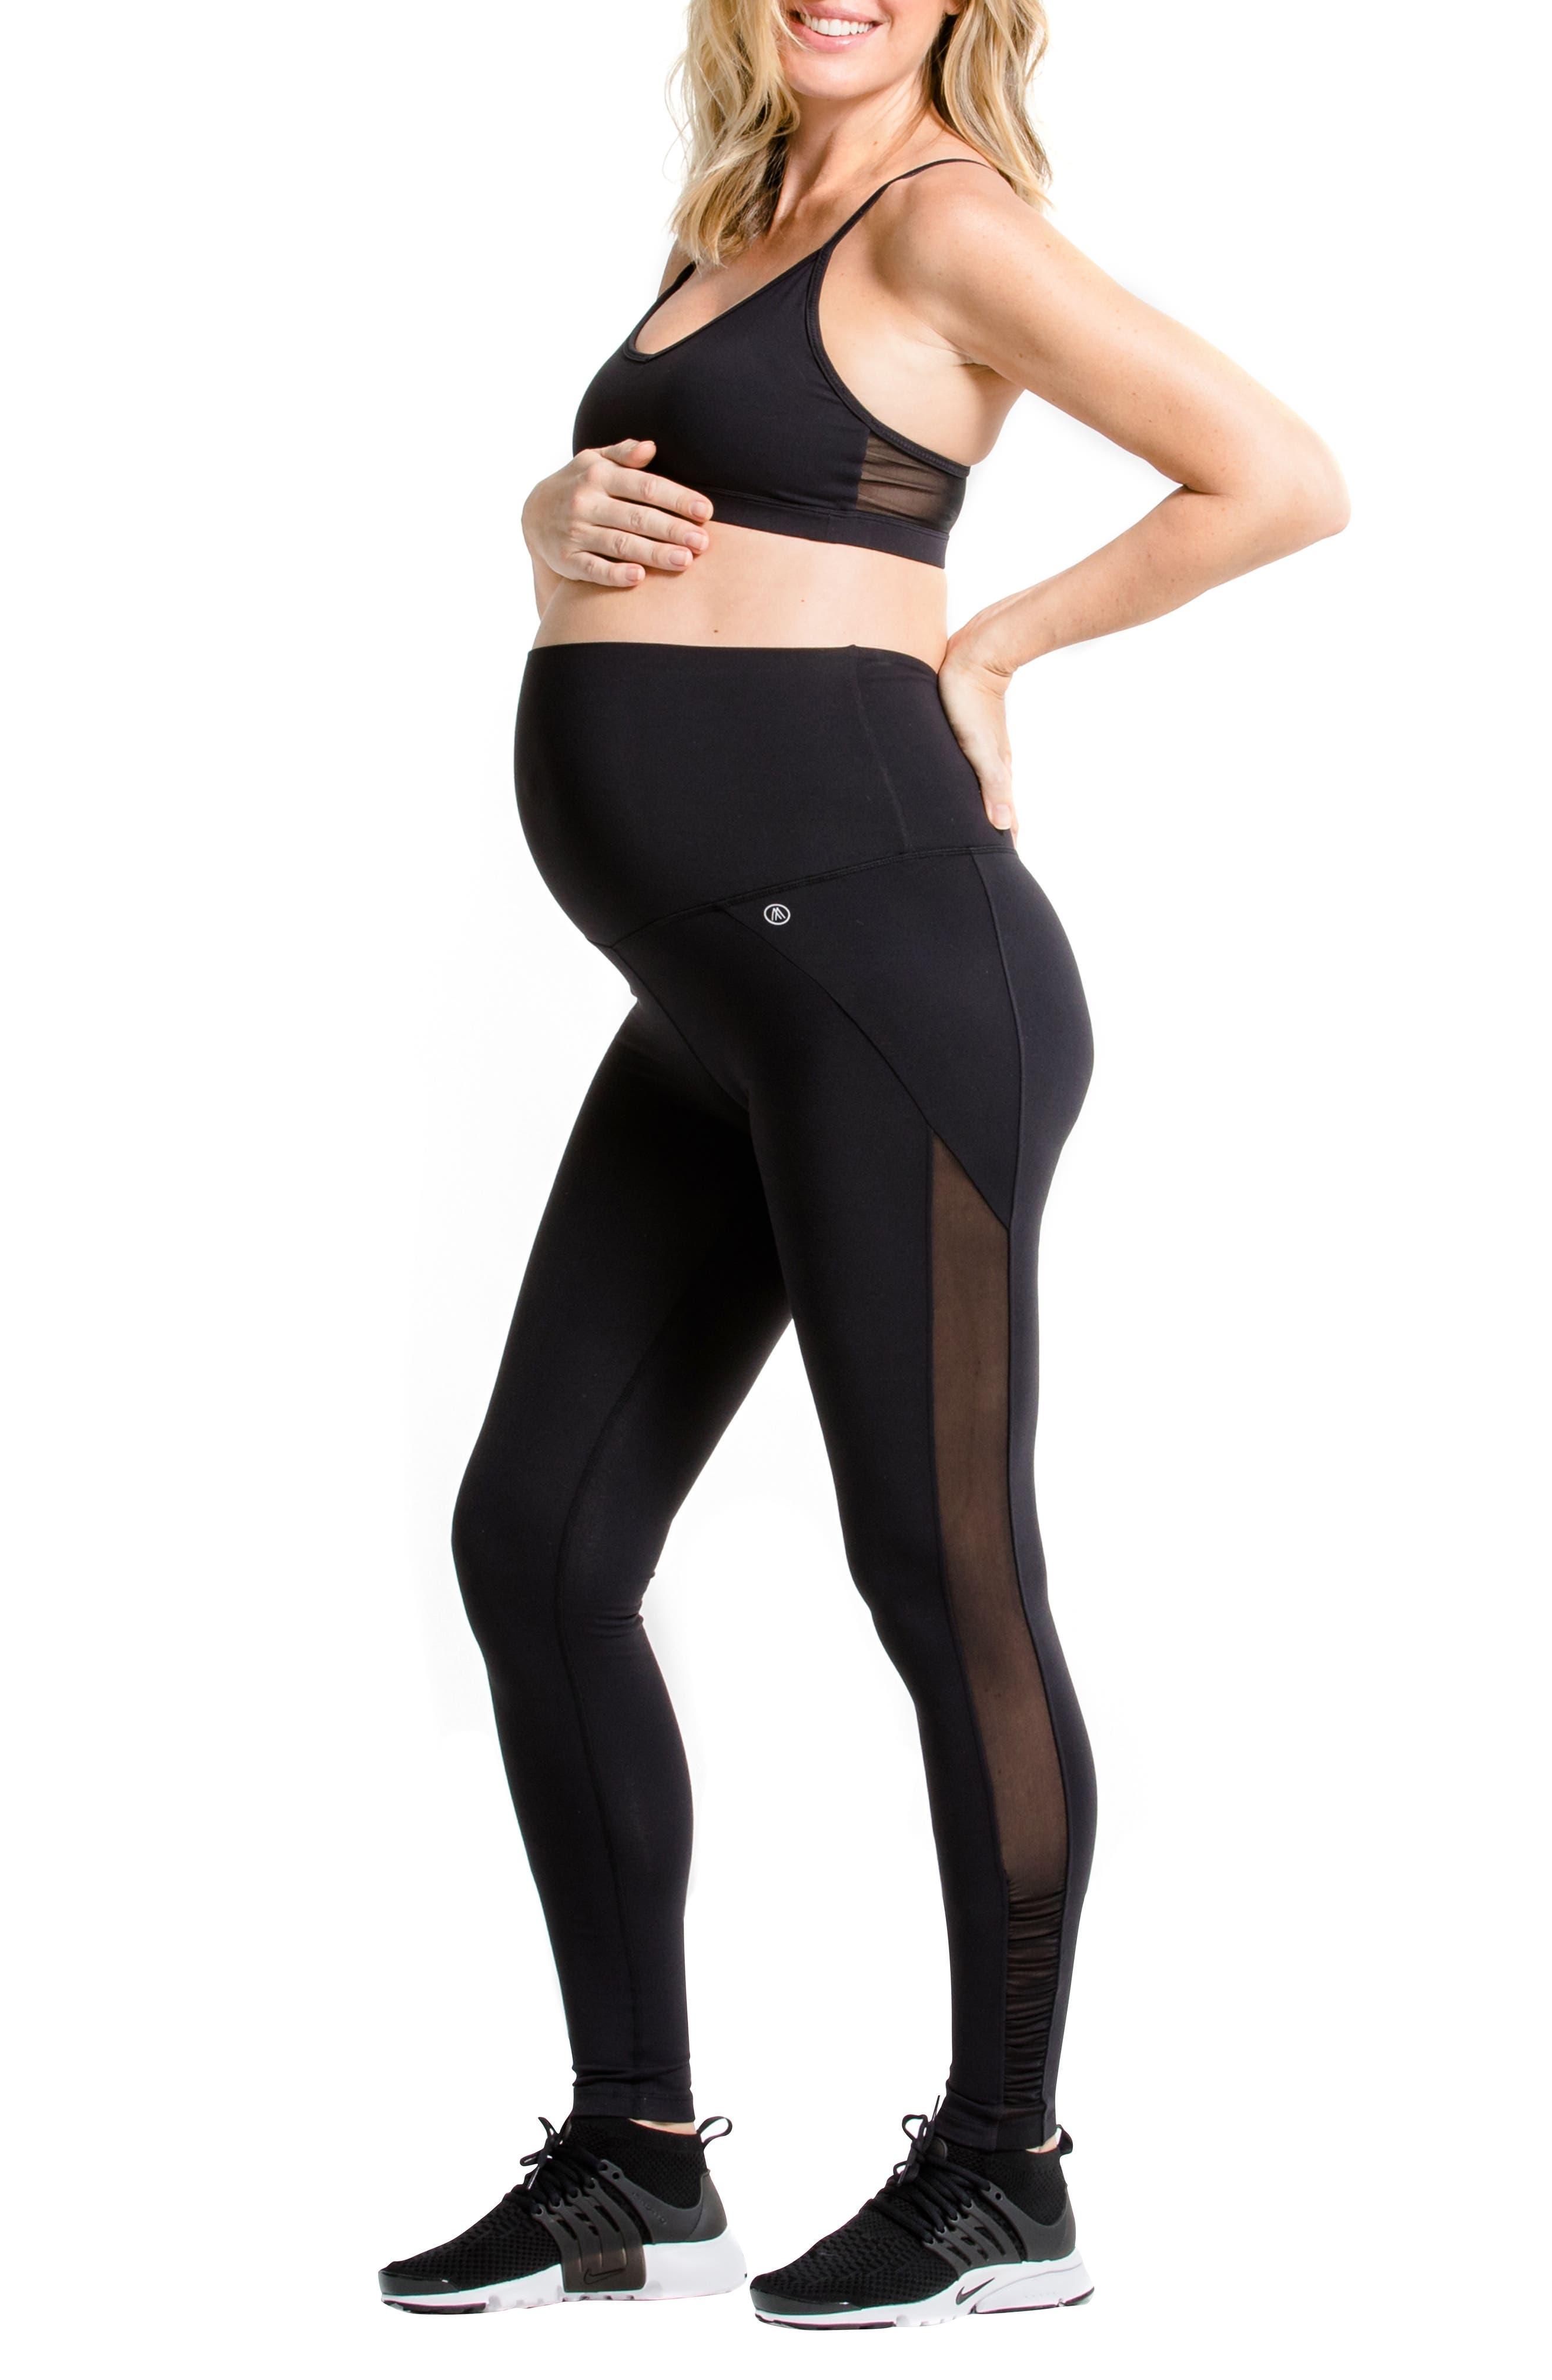 Juno Maternity Leggings,                             Main thumbnail 1, color,                             BLACK